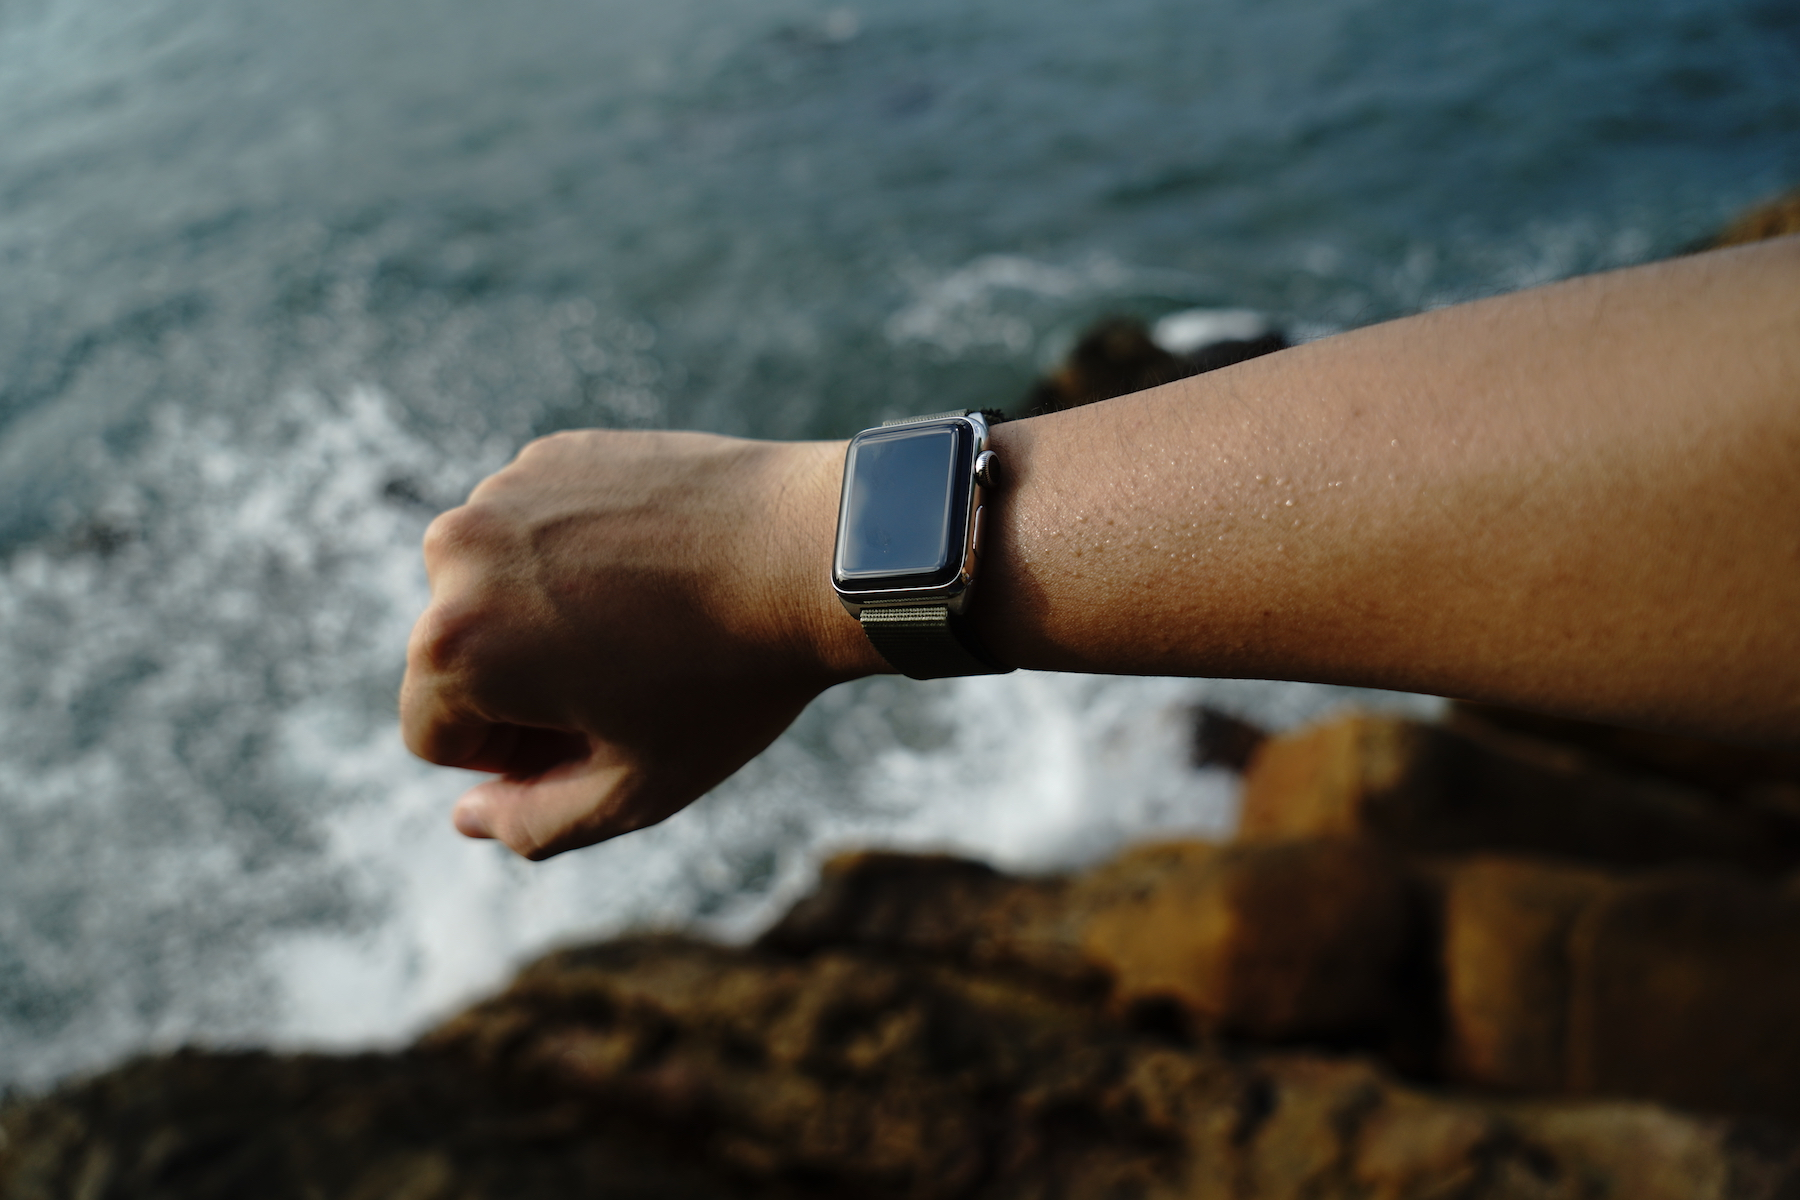 monowear-nylon-active-apple-watch-band-20